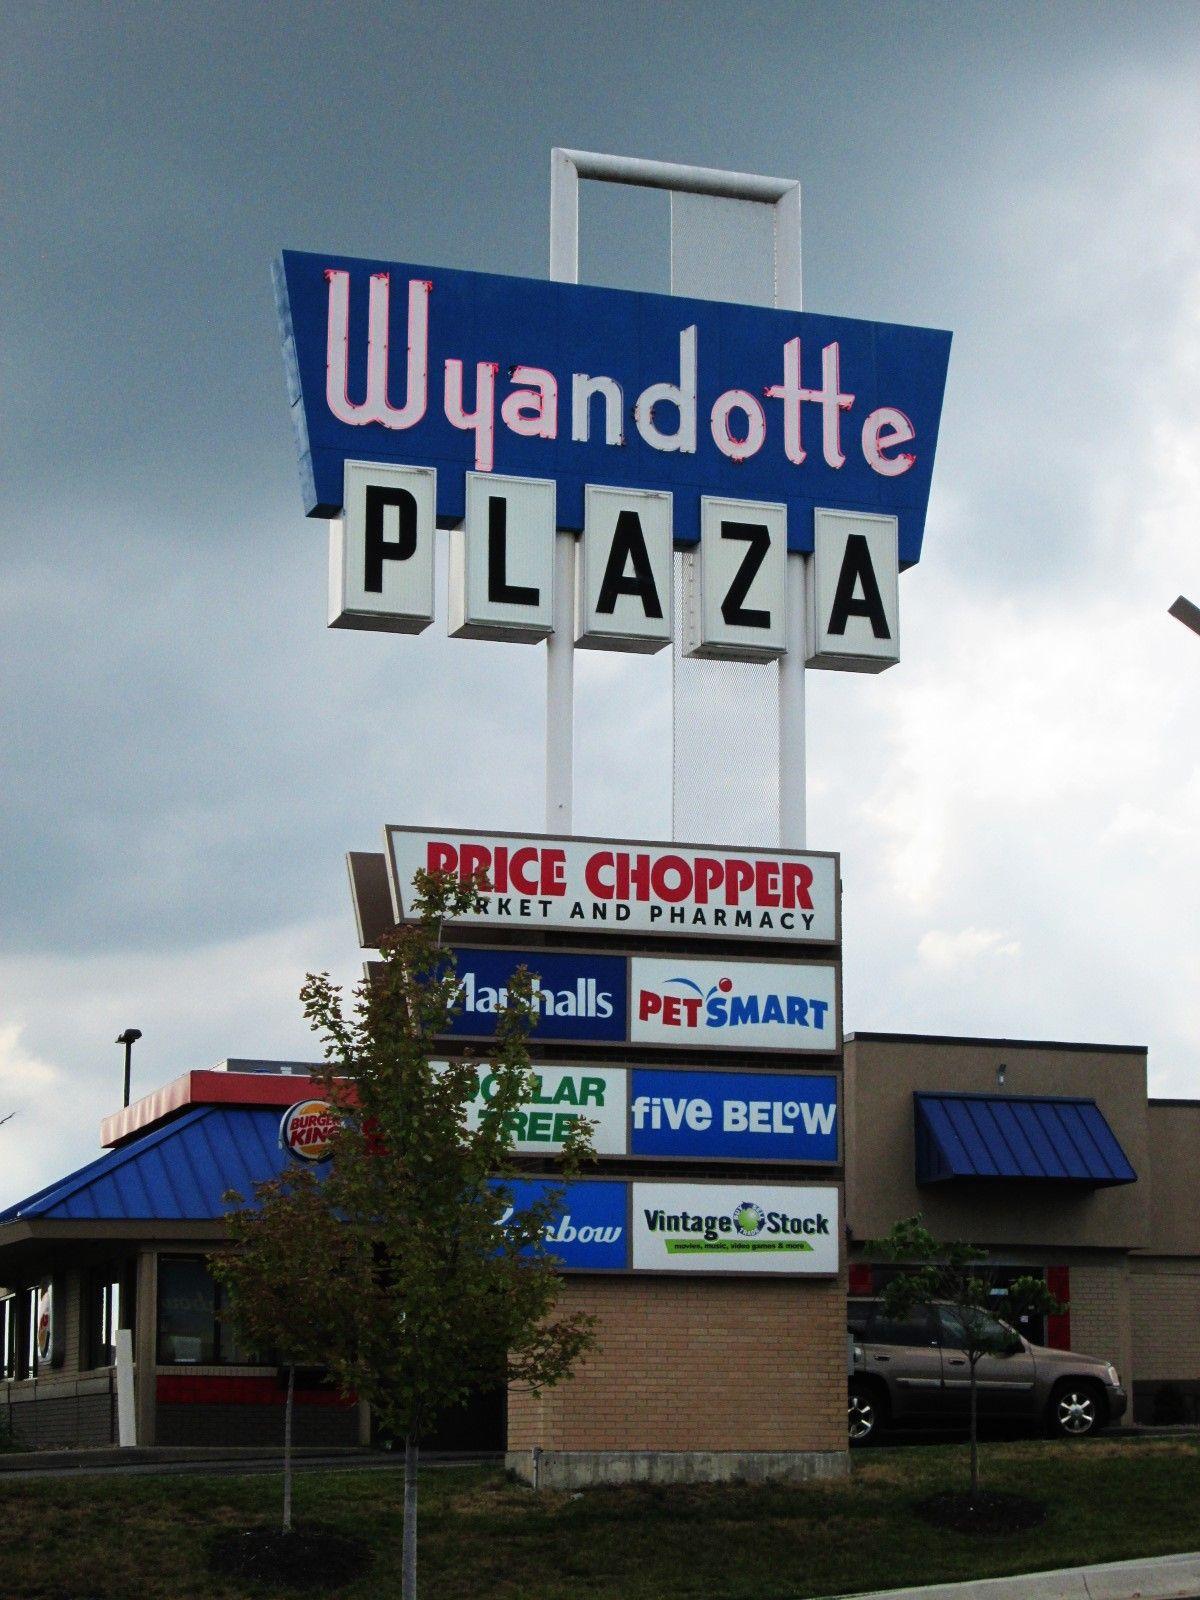 Wyandotte Plaza Instagram Photo Photo And Video Instagram